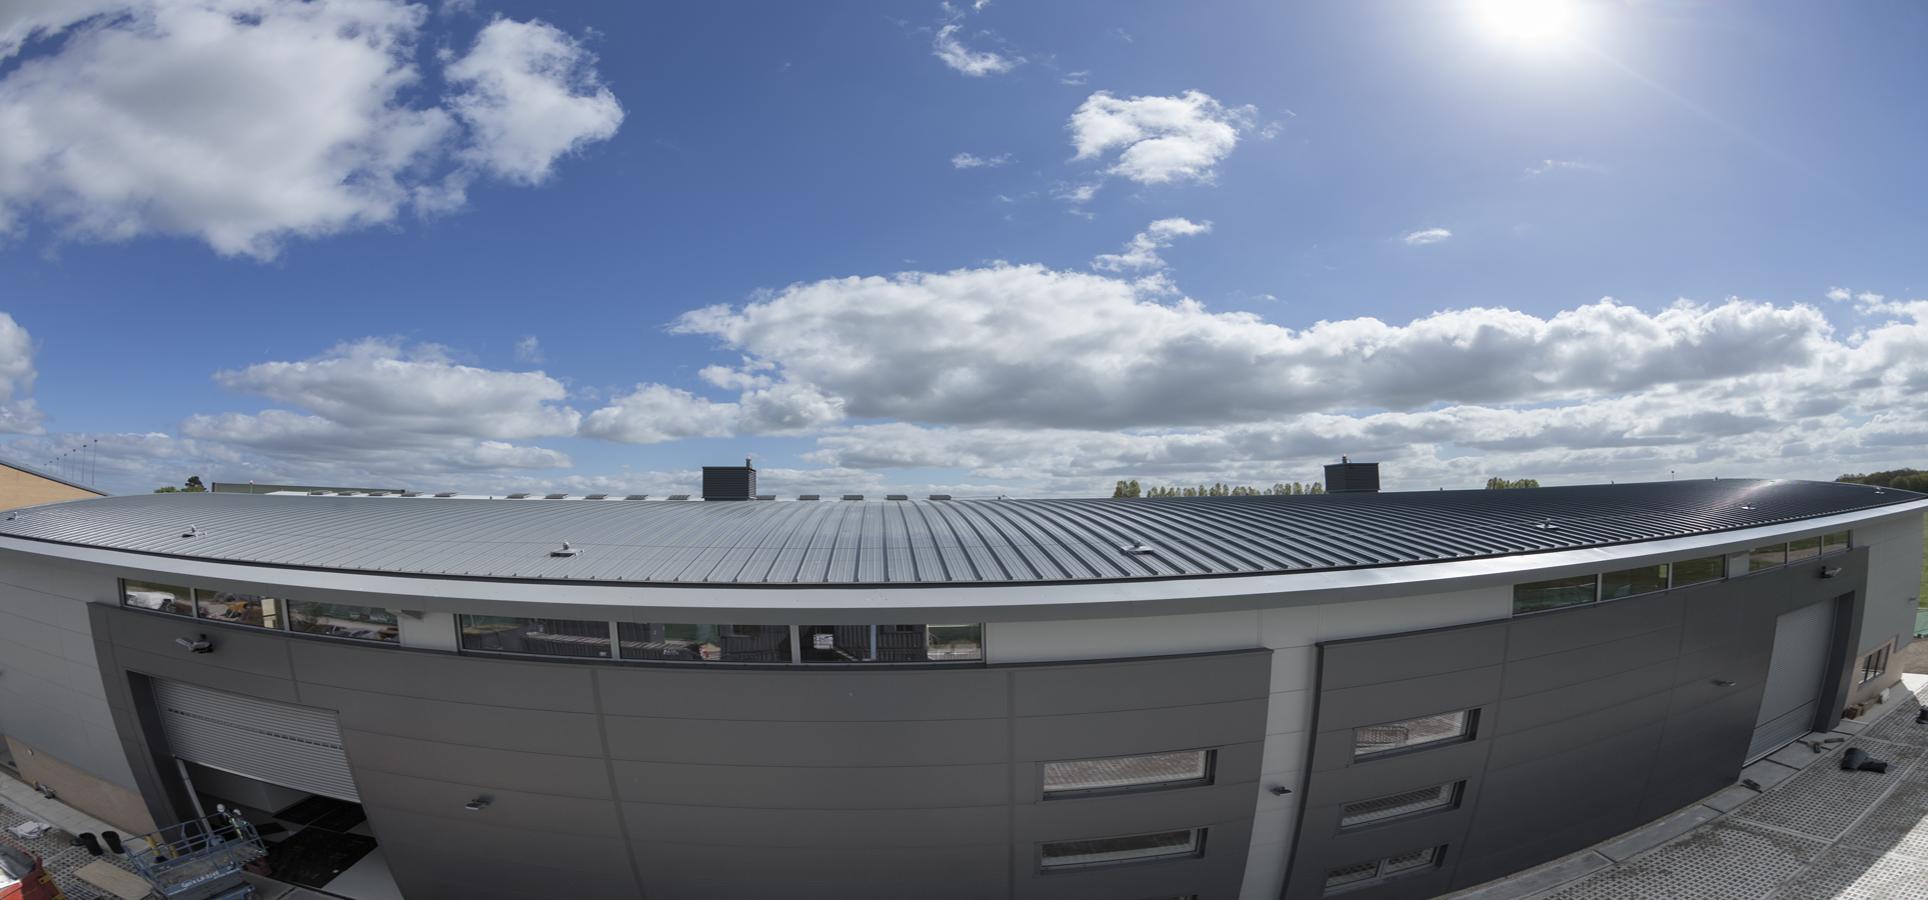 High-flying Jessops completes in Suffolk, Jessops Construction Ltd